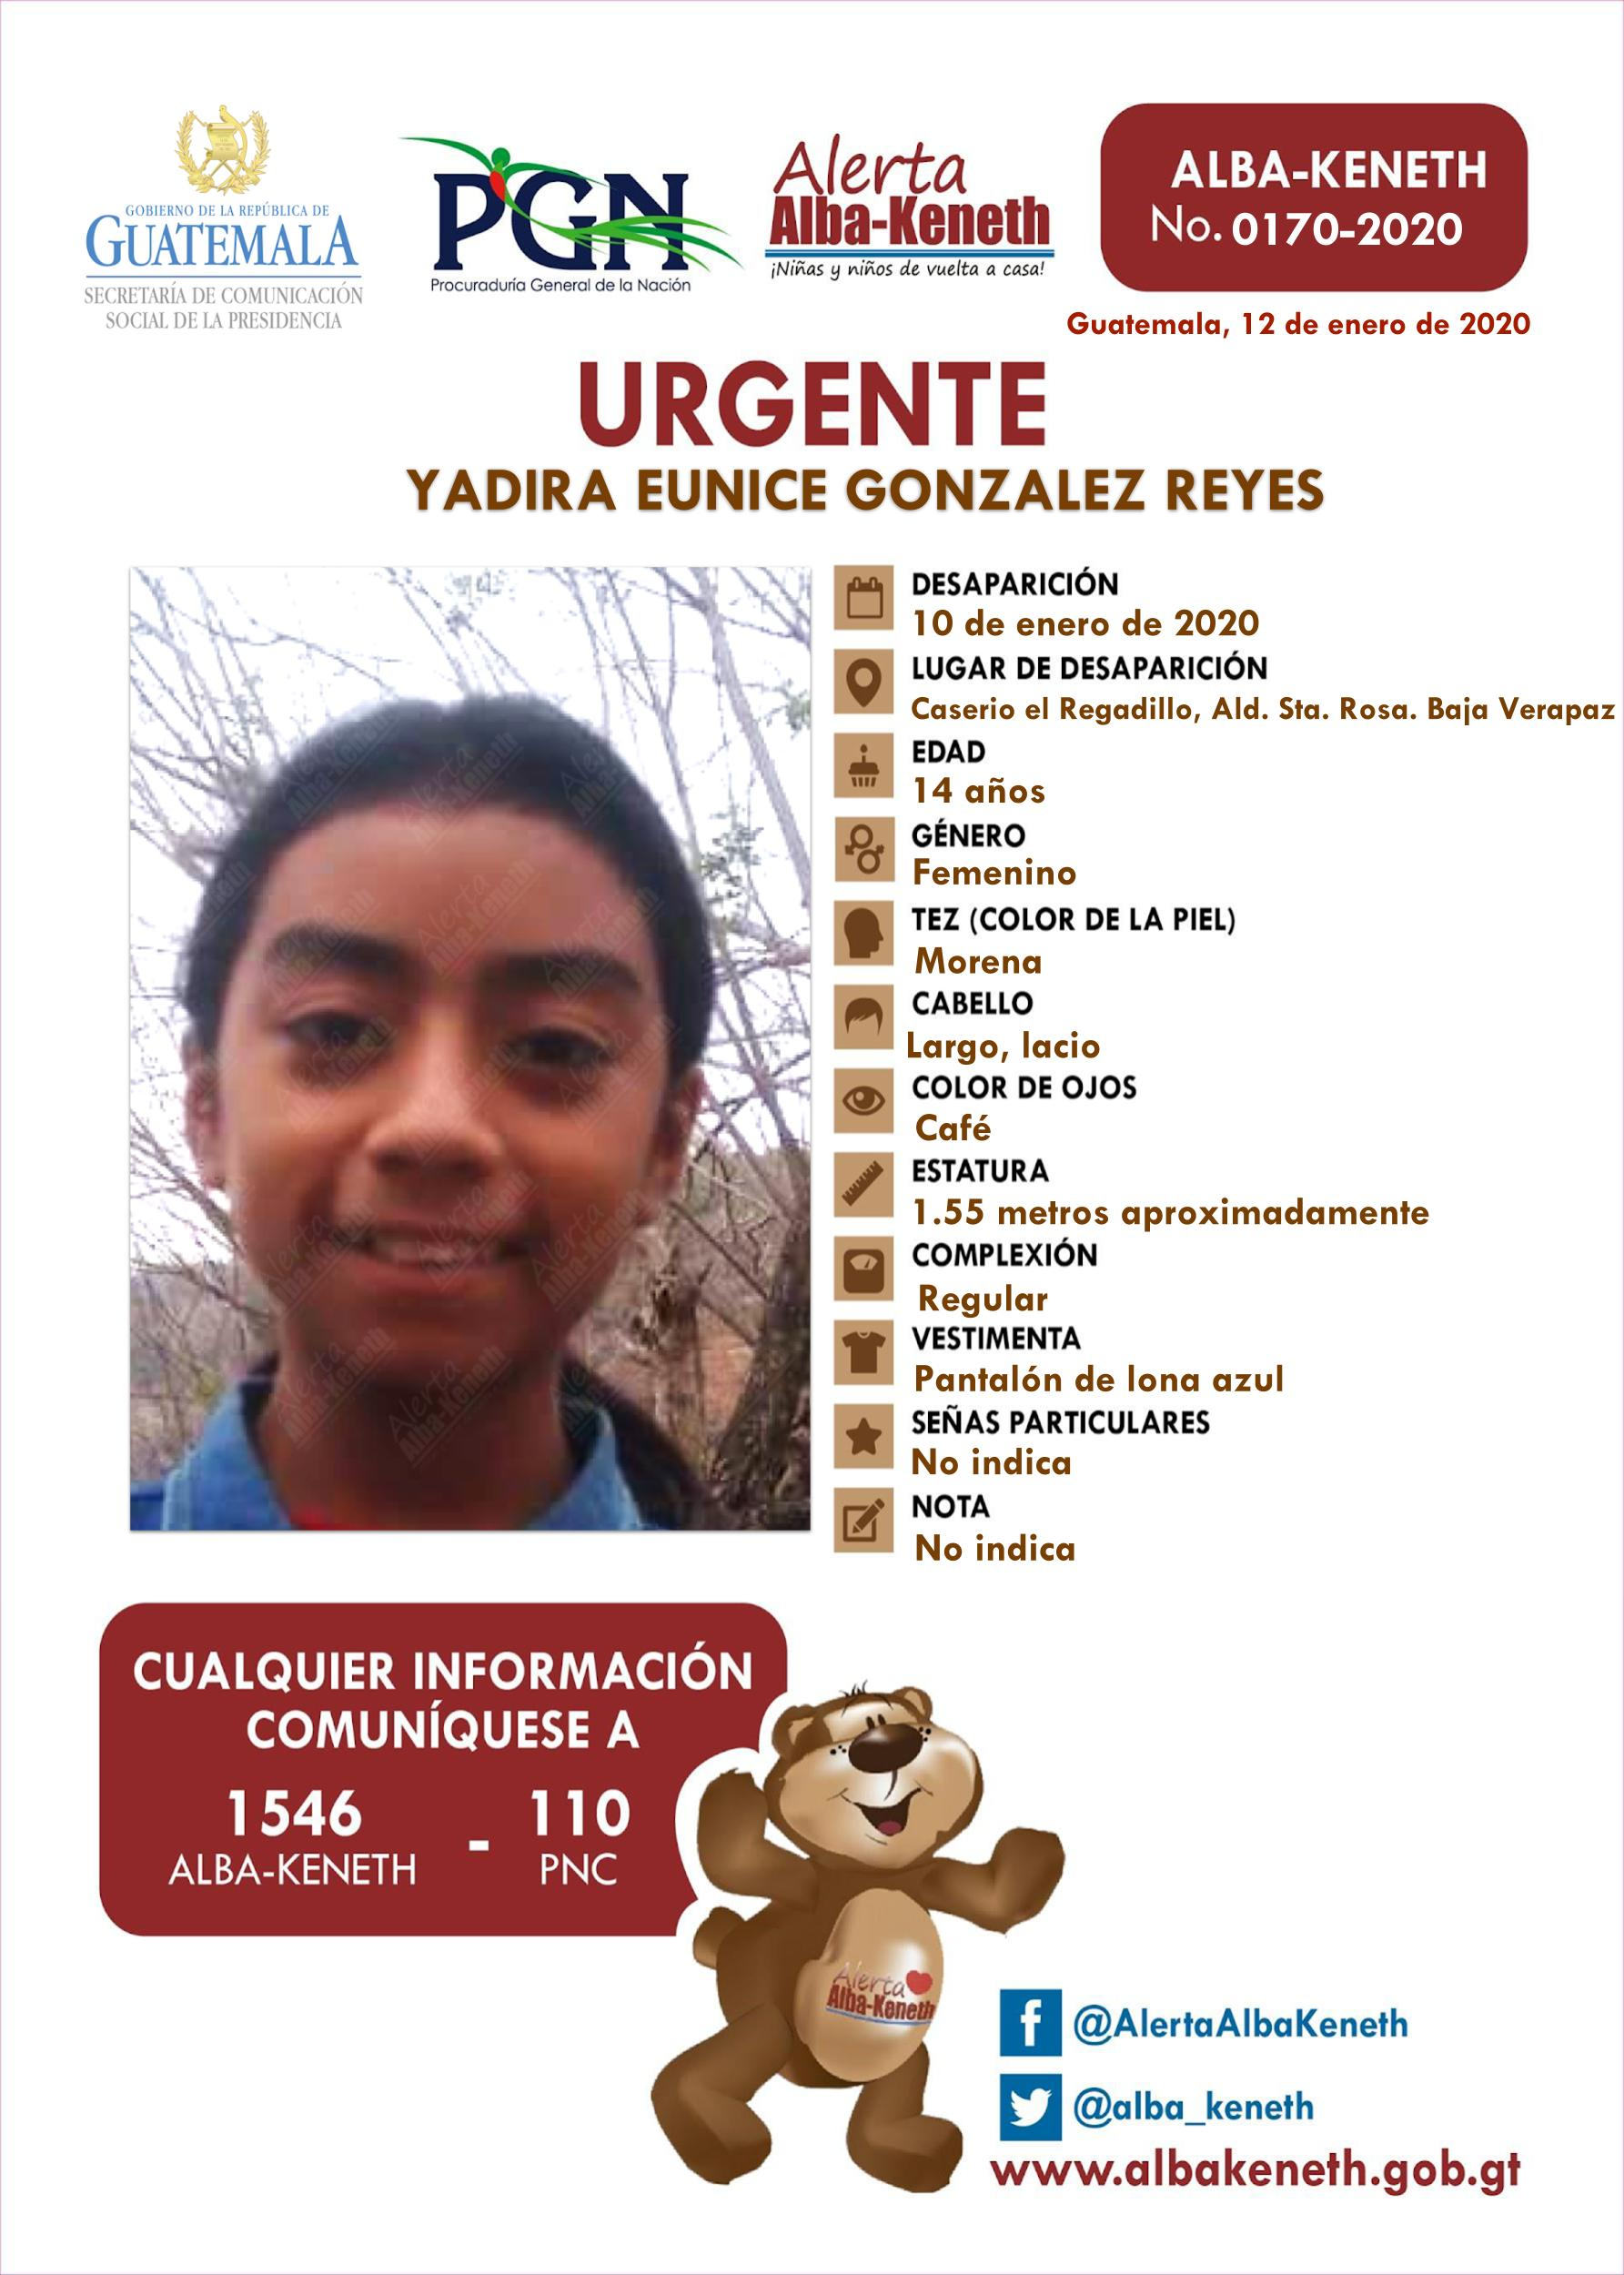 Yadira Eunice Gonzalez Reyes